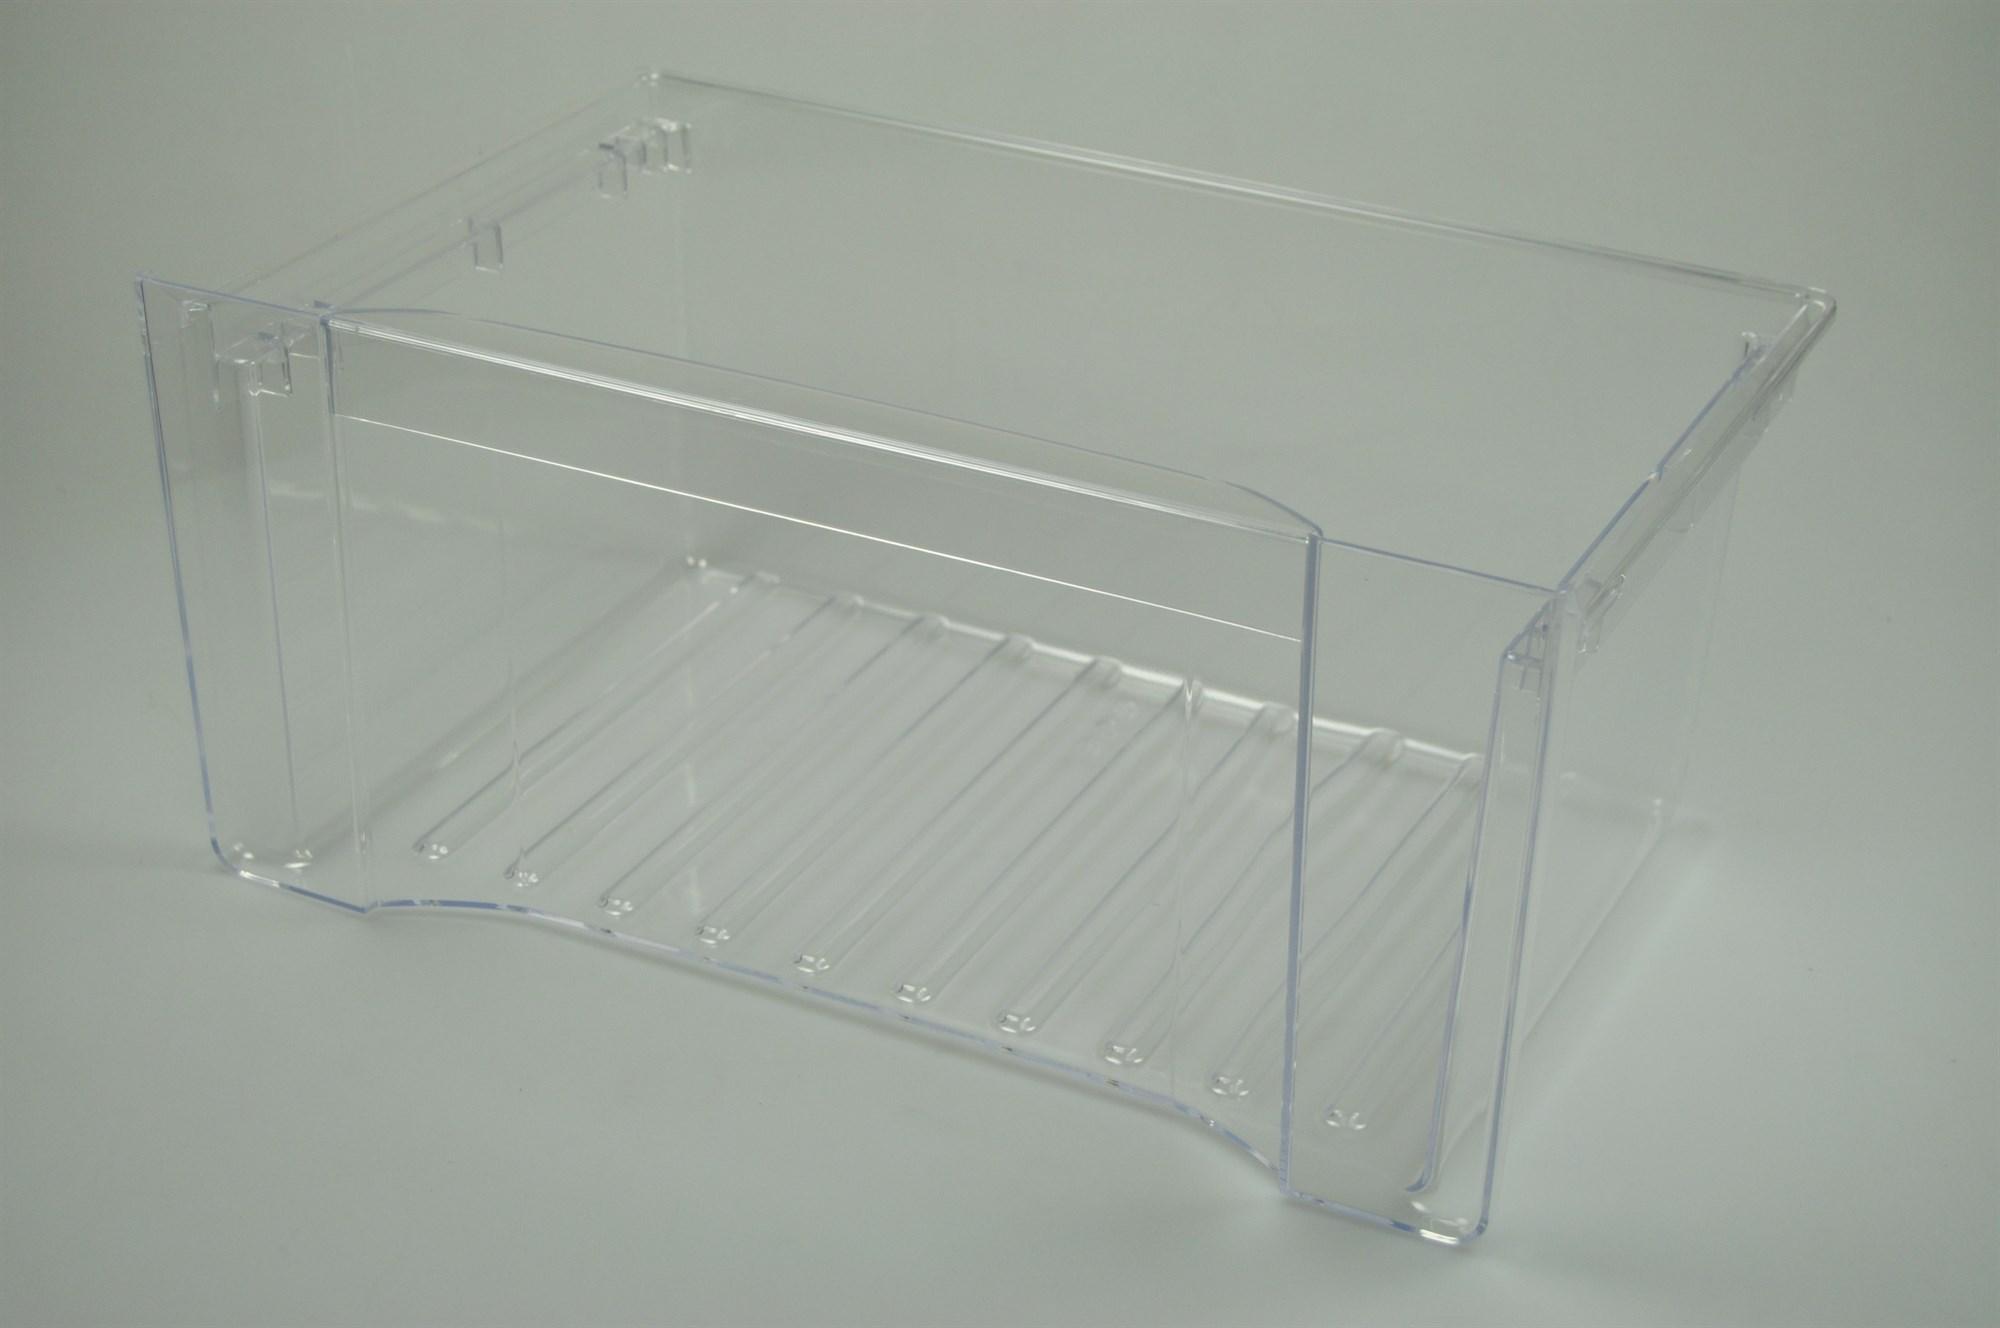 bac l gume smeg frigo cong lateur 208mm x 435mm x 265mm. Black Bedroom Furniture Sets. Home Design Ideas